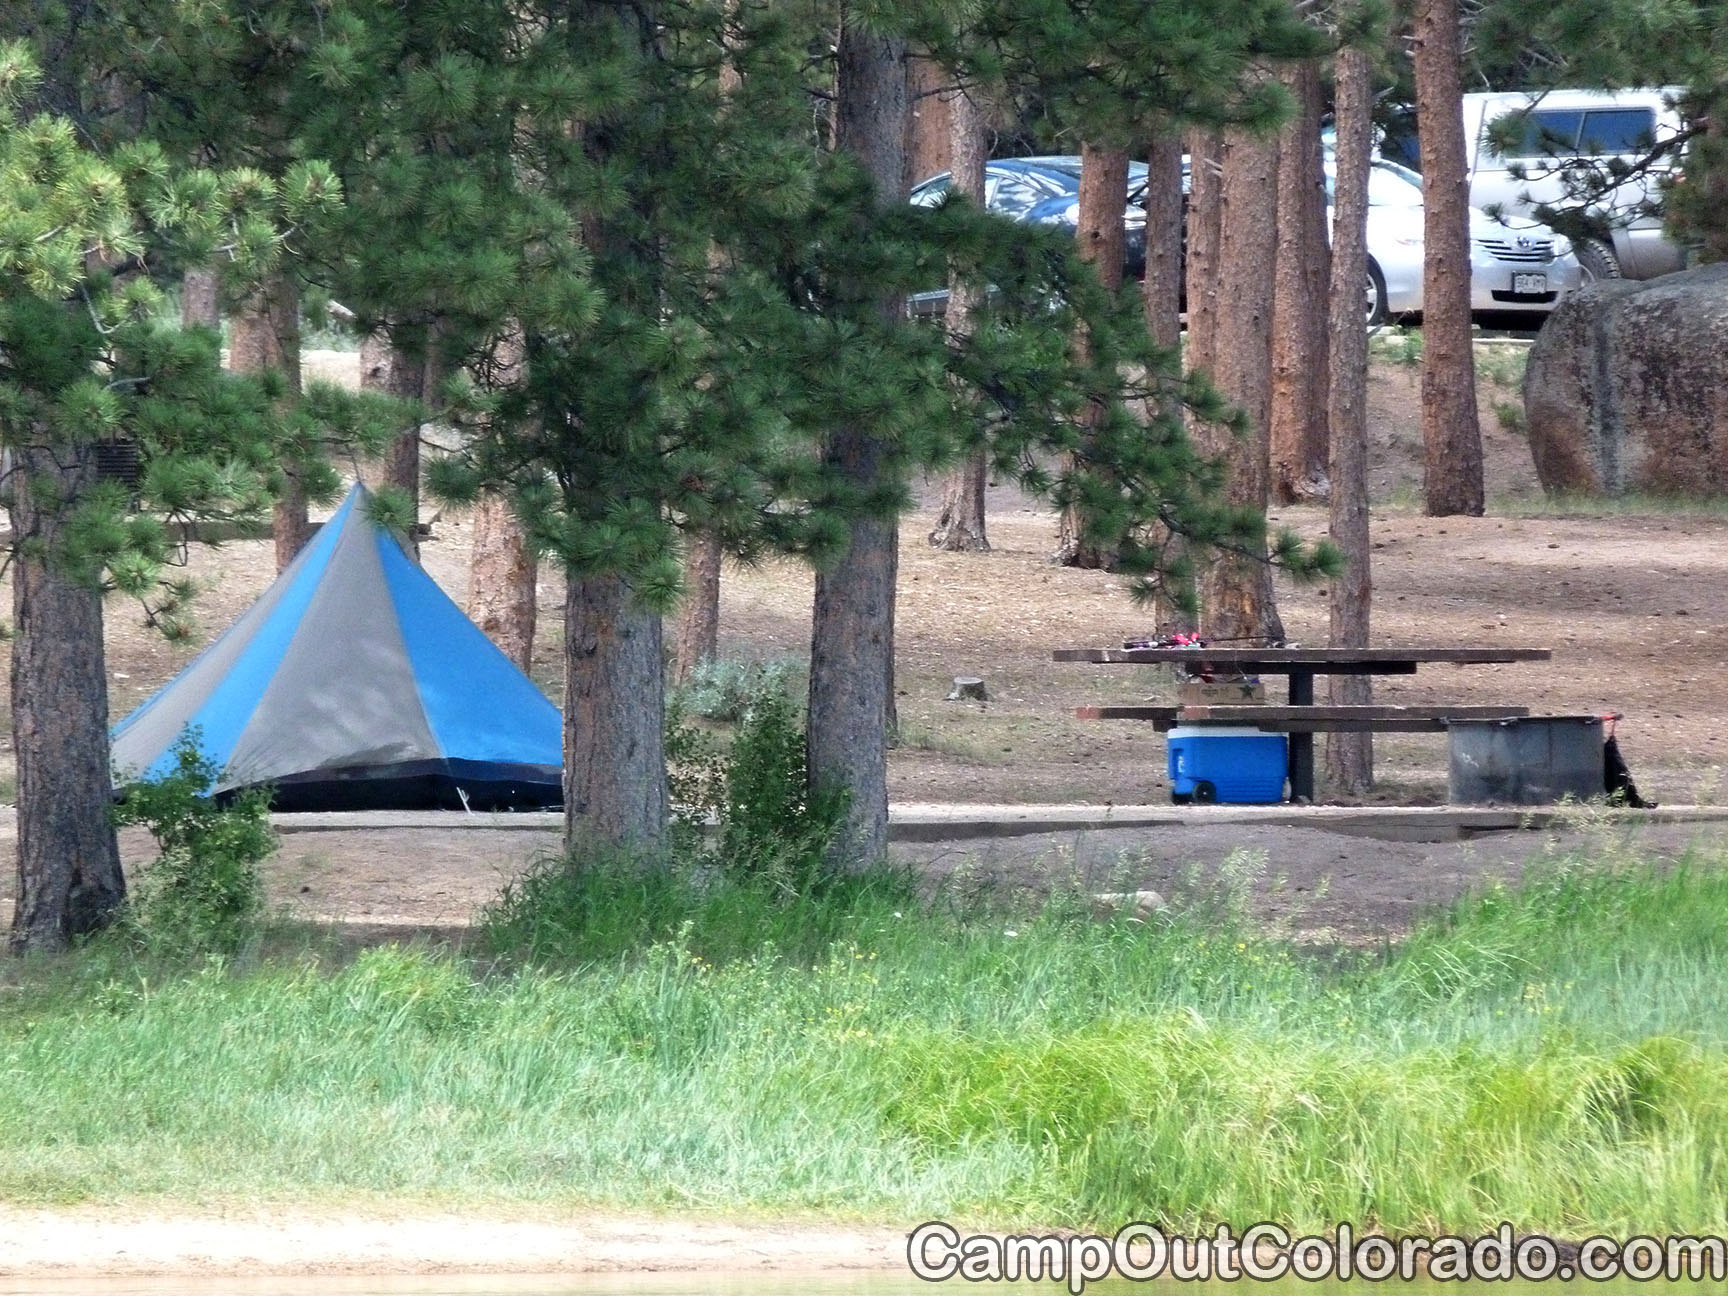 Campoutcolorado-dowdy-lake-campground-tent-camping